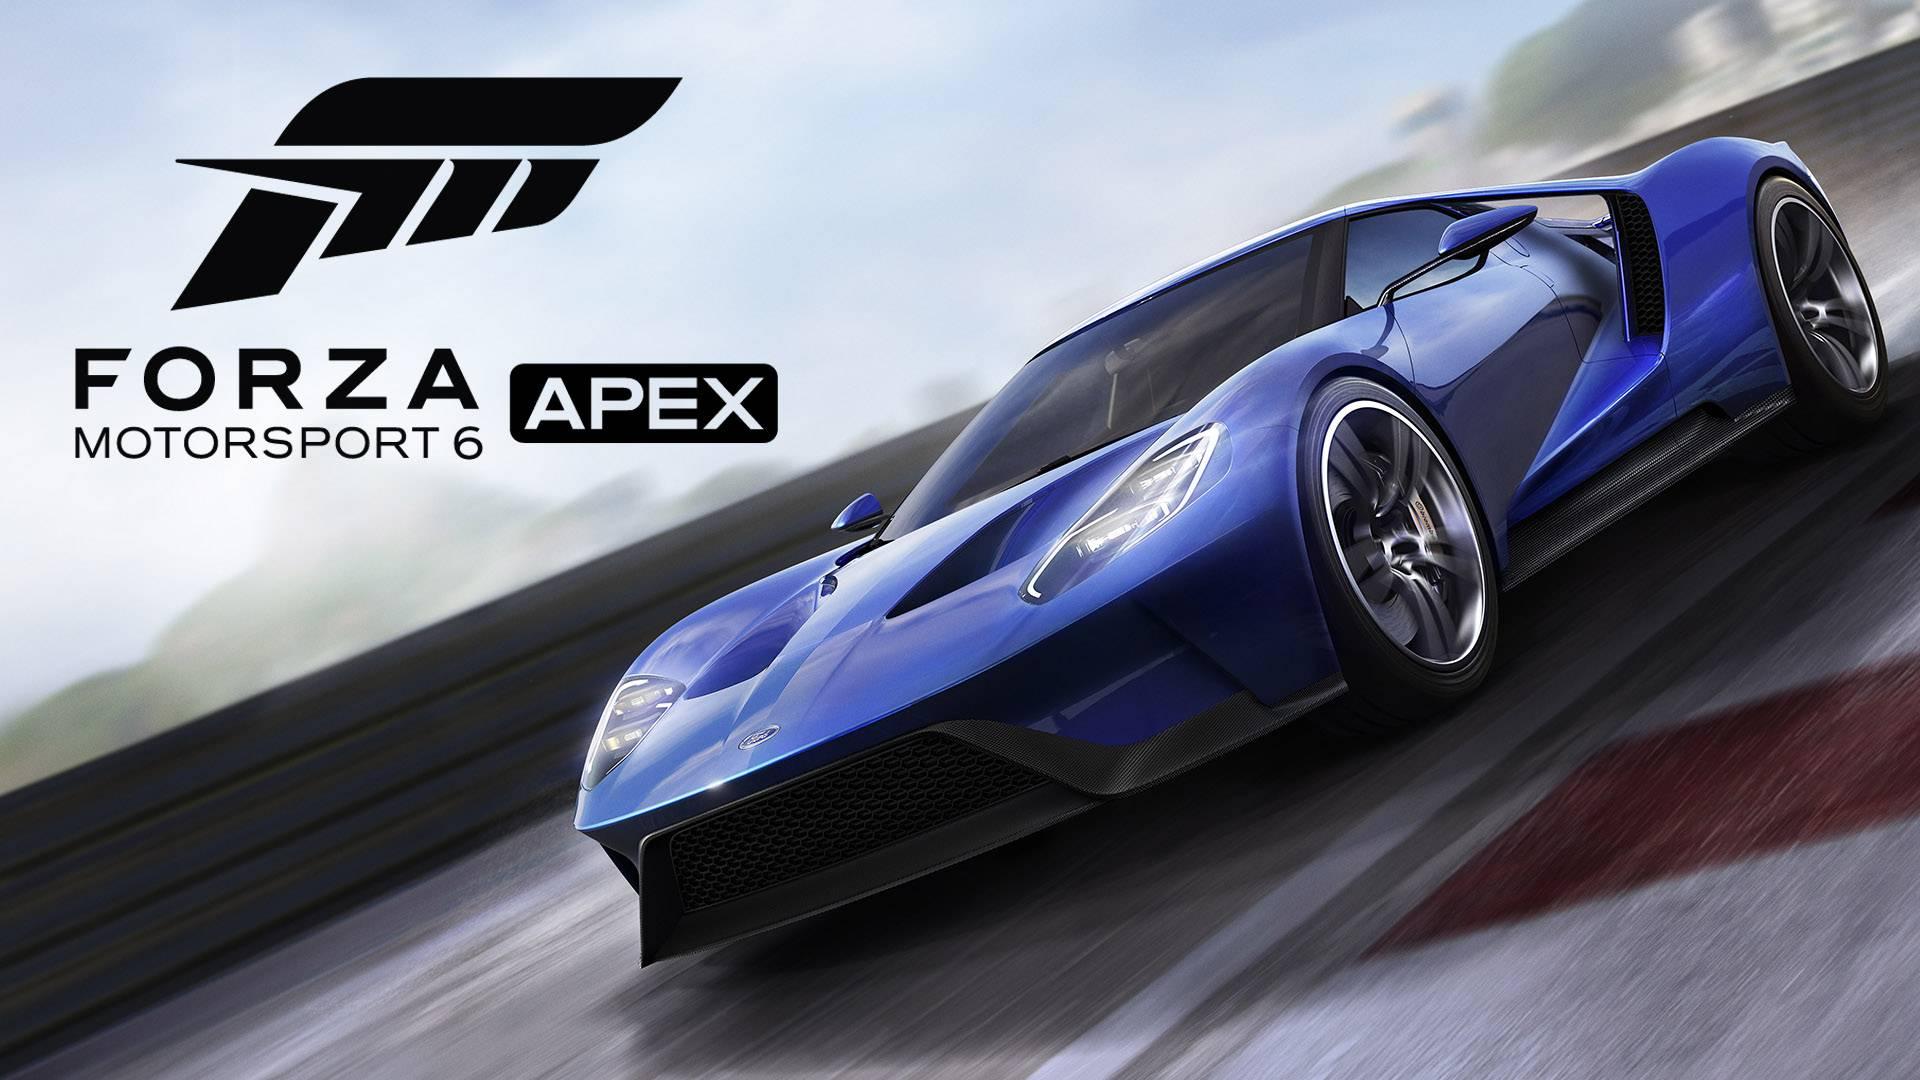 「Forza Motorsport 6: Apex」が配信開始。シリーズ初の基本プレイ無料&Windows 10向けタイトル